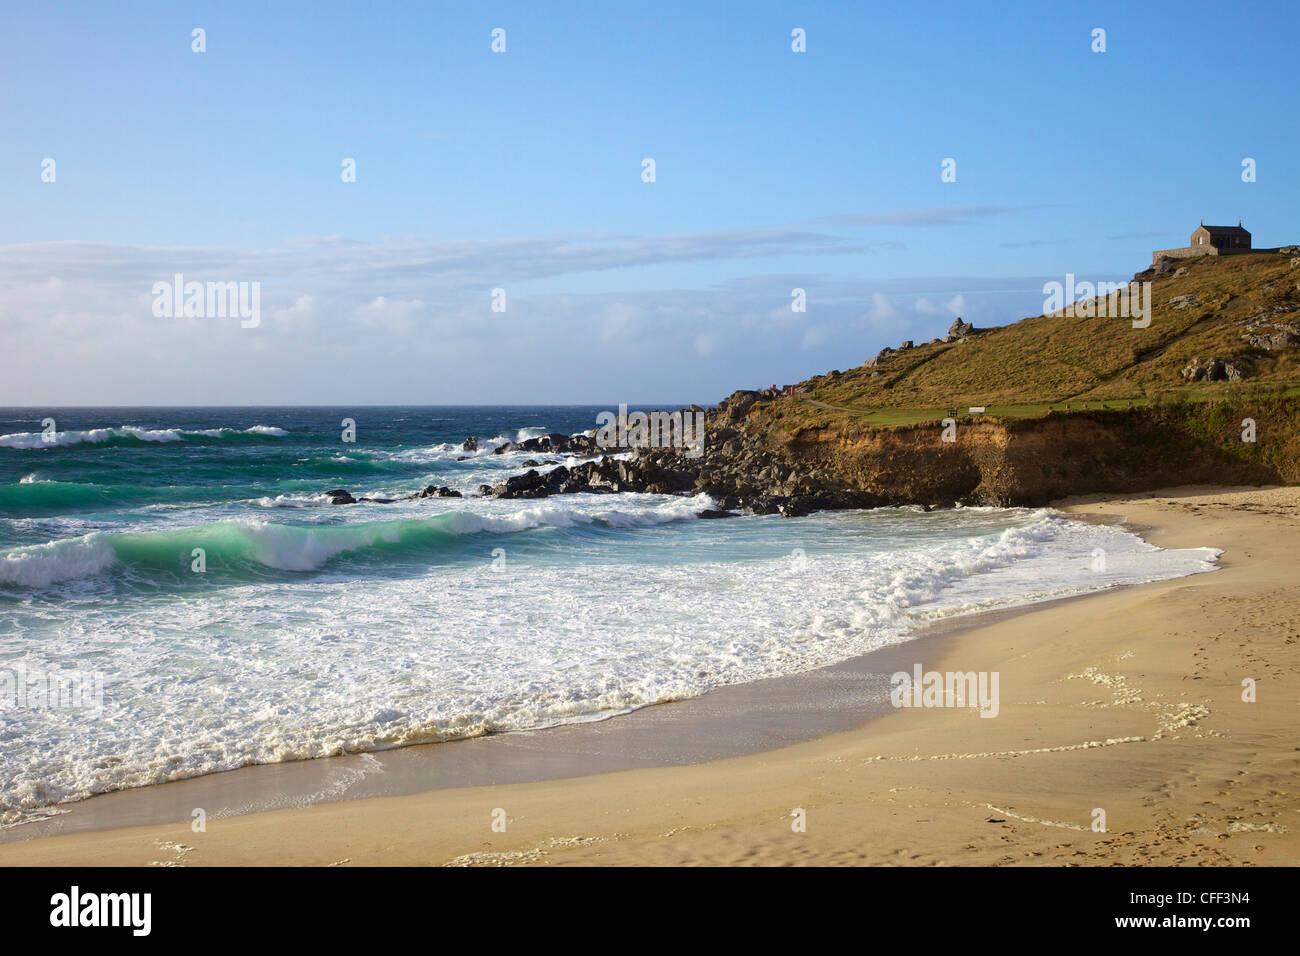 Surf in sea off Porthmeor beach in evening sun, St. Nicholas chapel on the island, St. Ives, Cornwall, England, Stock Photo